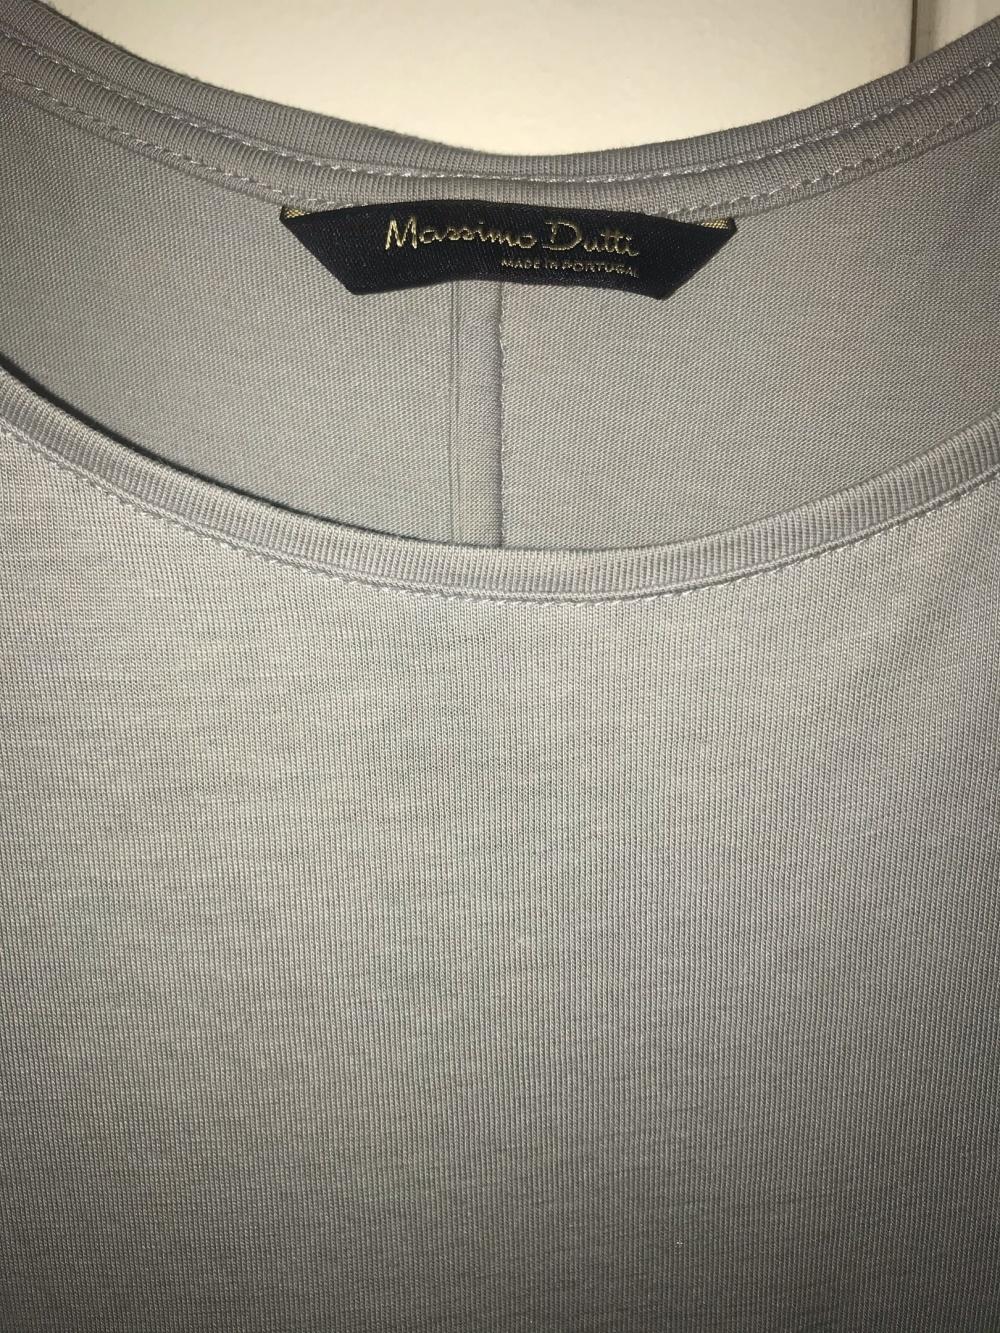 Блуза - лонгслив Massimo Dutti, размер М